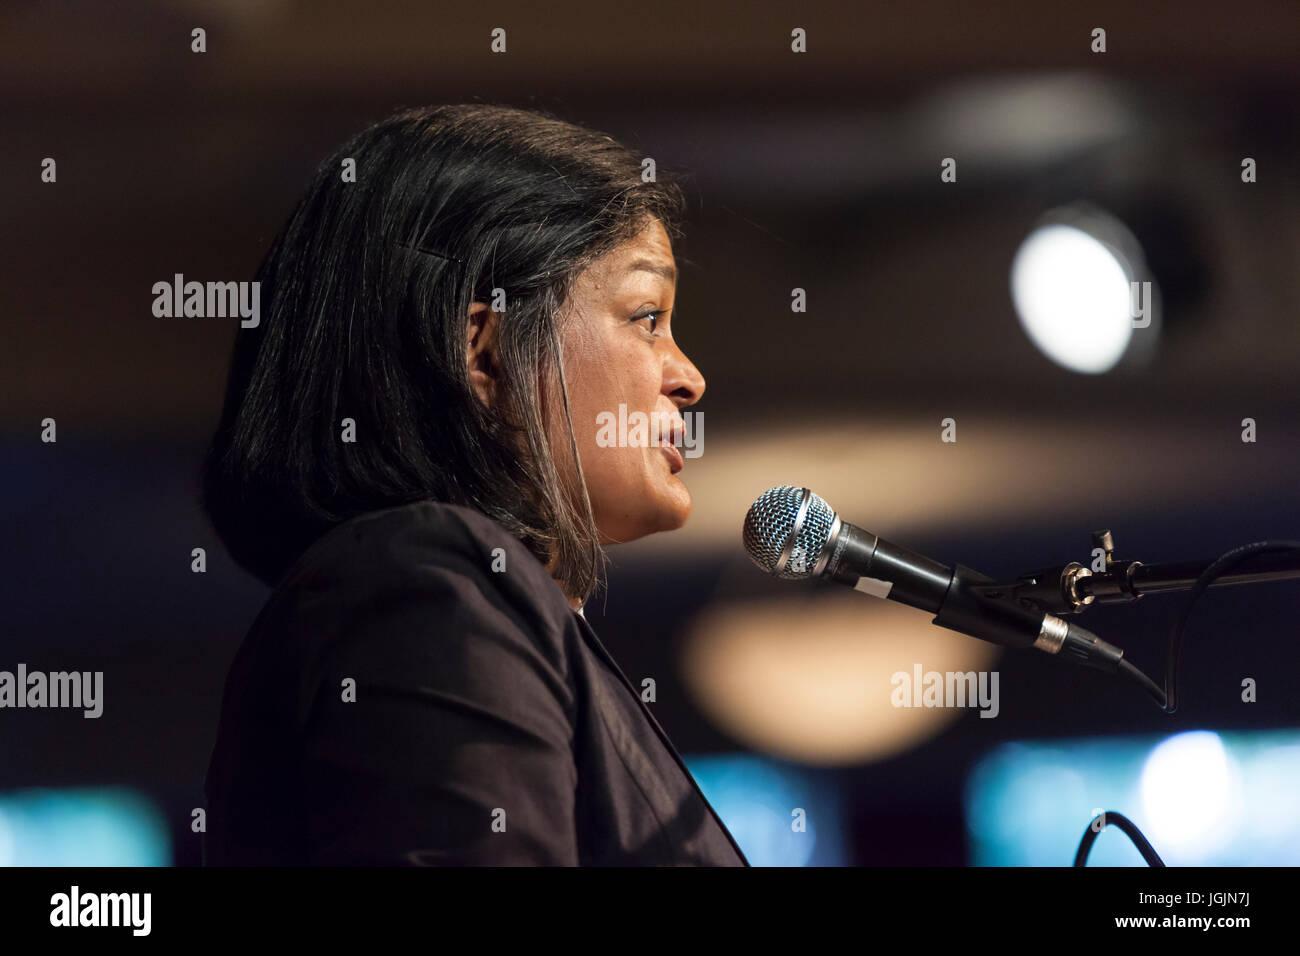 Seattle, USA. 6th Jul, 2017. Congresswoman Pramila Jayapal spoke to hundreds at Town Hall Seattle. The first-term - Stock Image